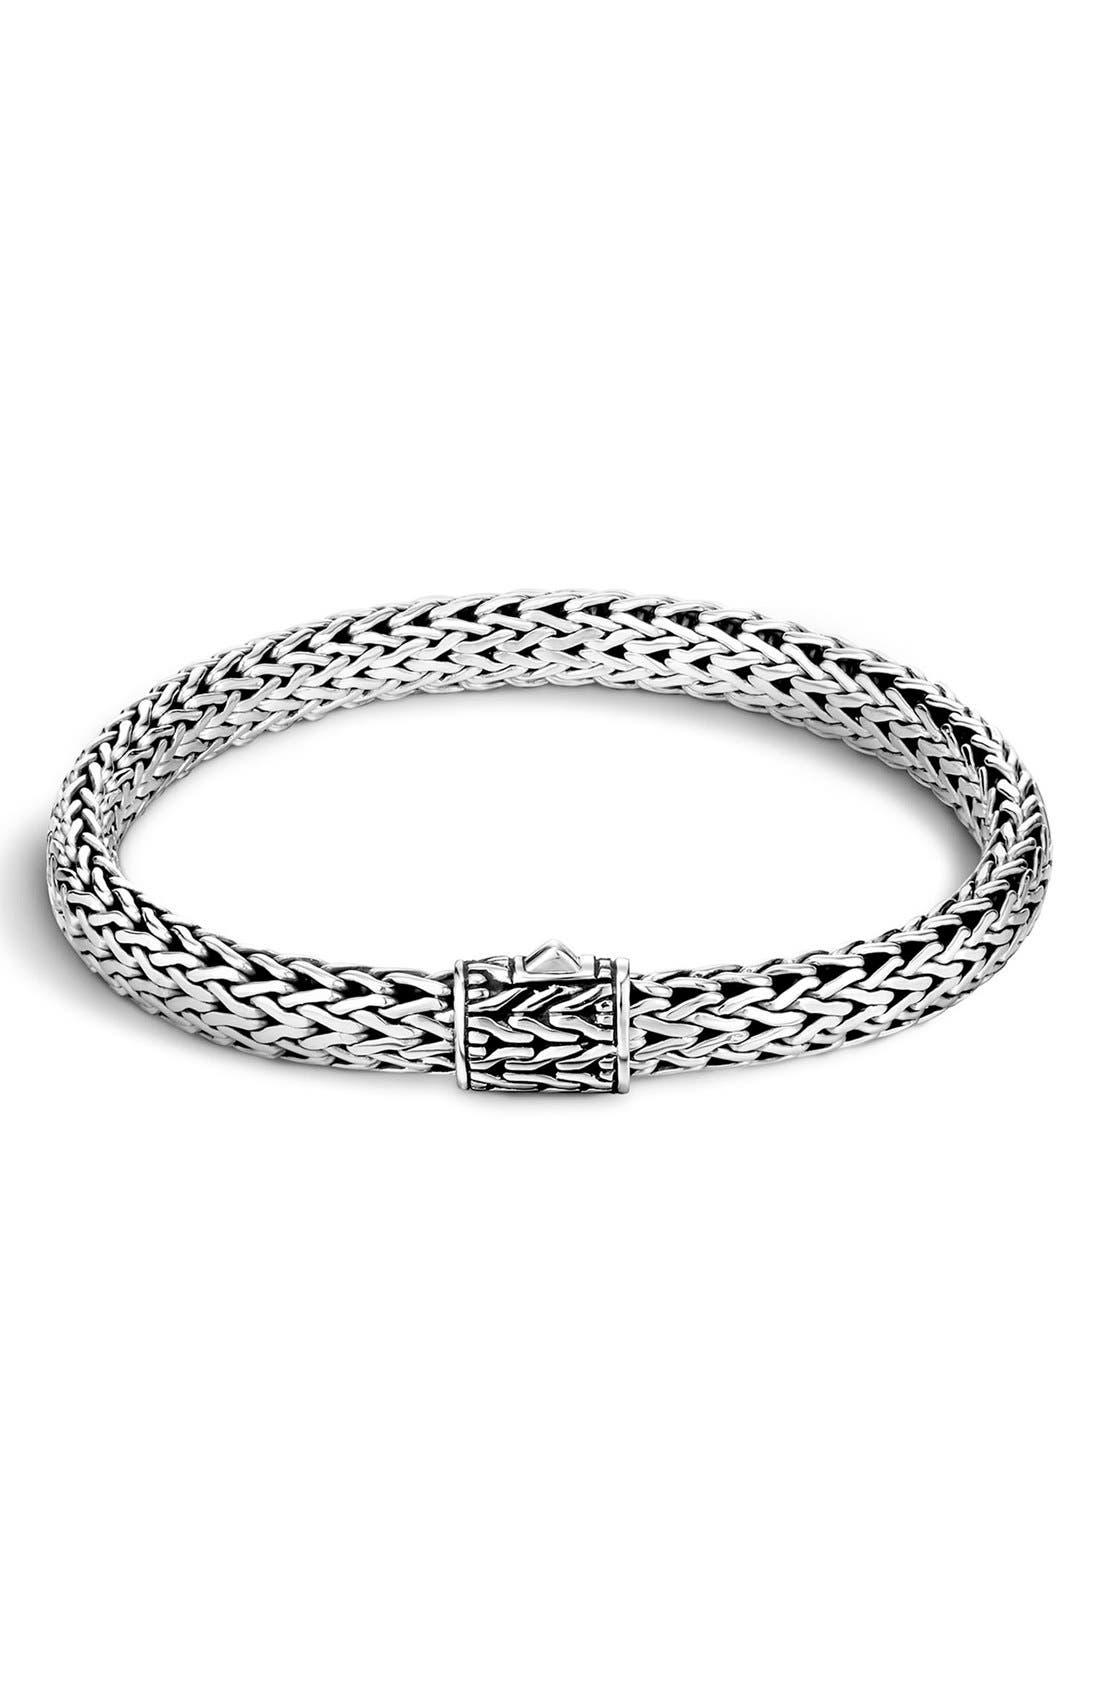 JOHN HARDY Classic Chain 6.5mm Bracelet